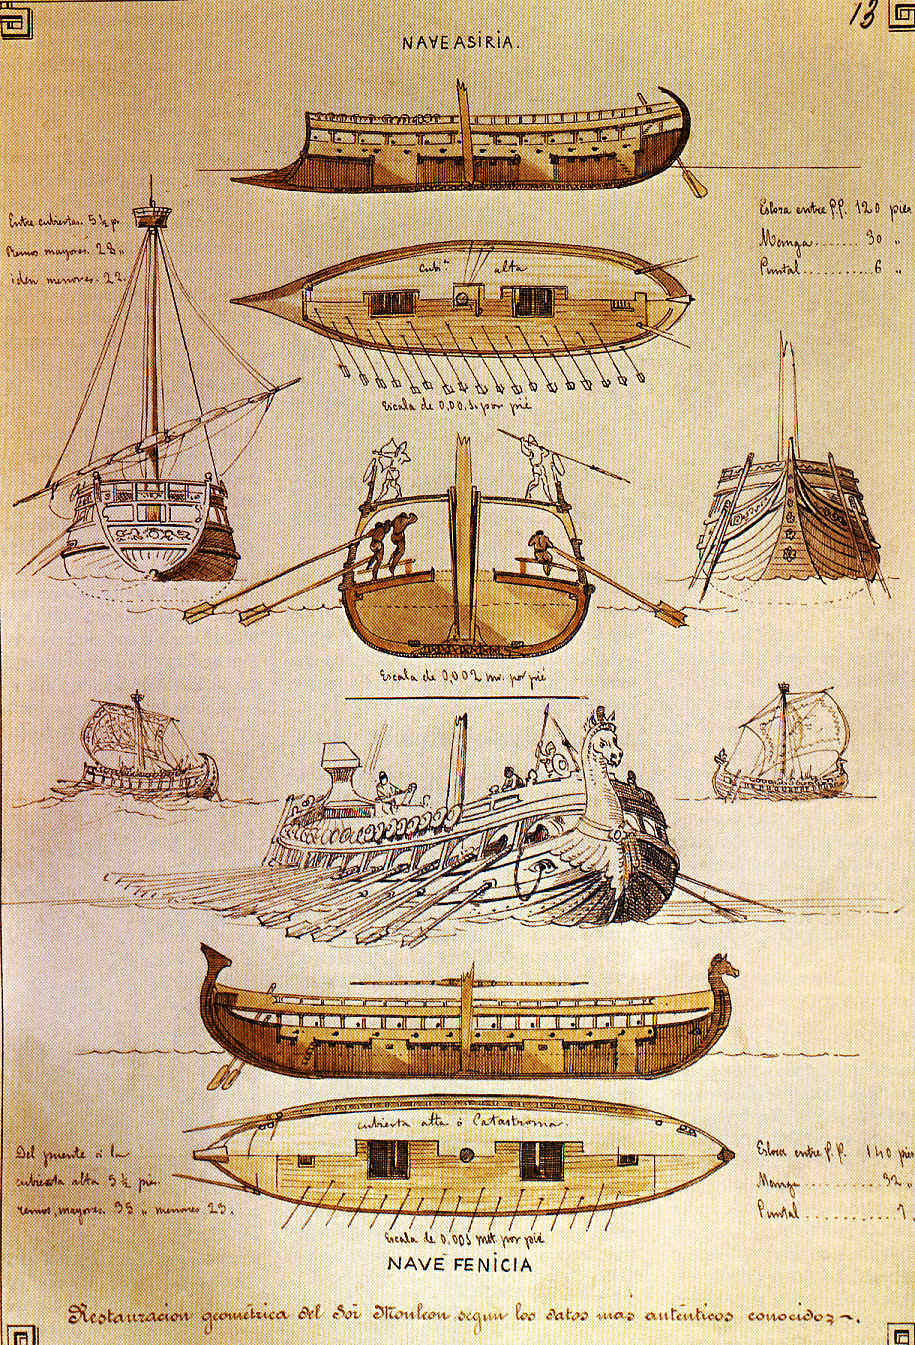 La batalla de Salamina 1 en la Grecia clásica 52